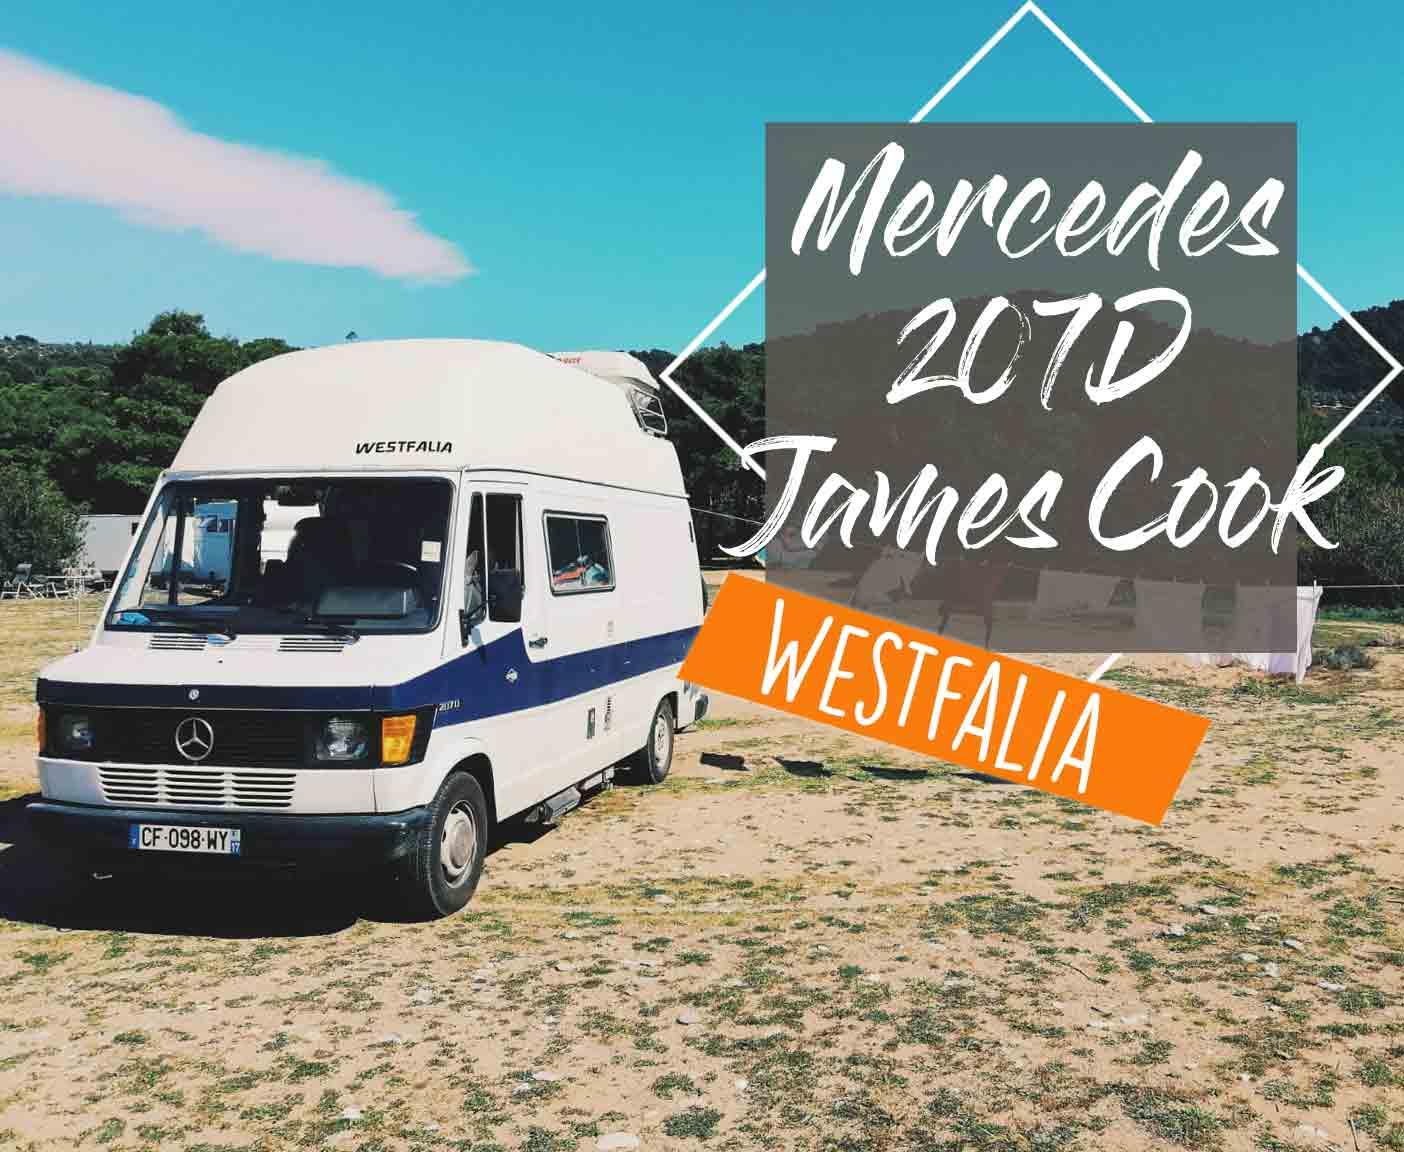 mercedes-207-d-james-cook-westfalia-van-fourgon-amenage-camping-car-oldschool-vanlife-roadtrip-europe-travel-voyage